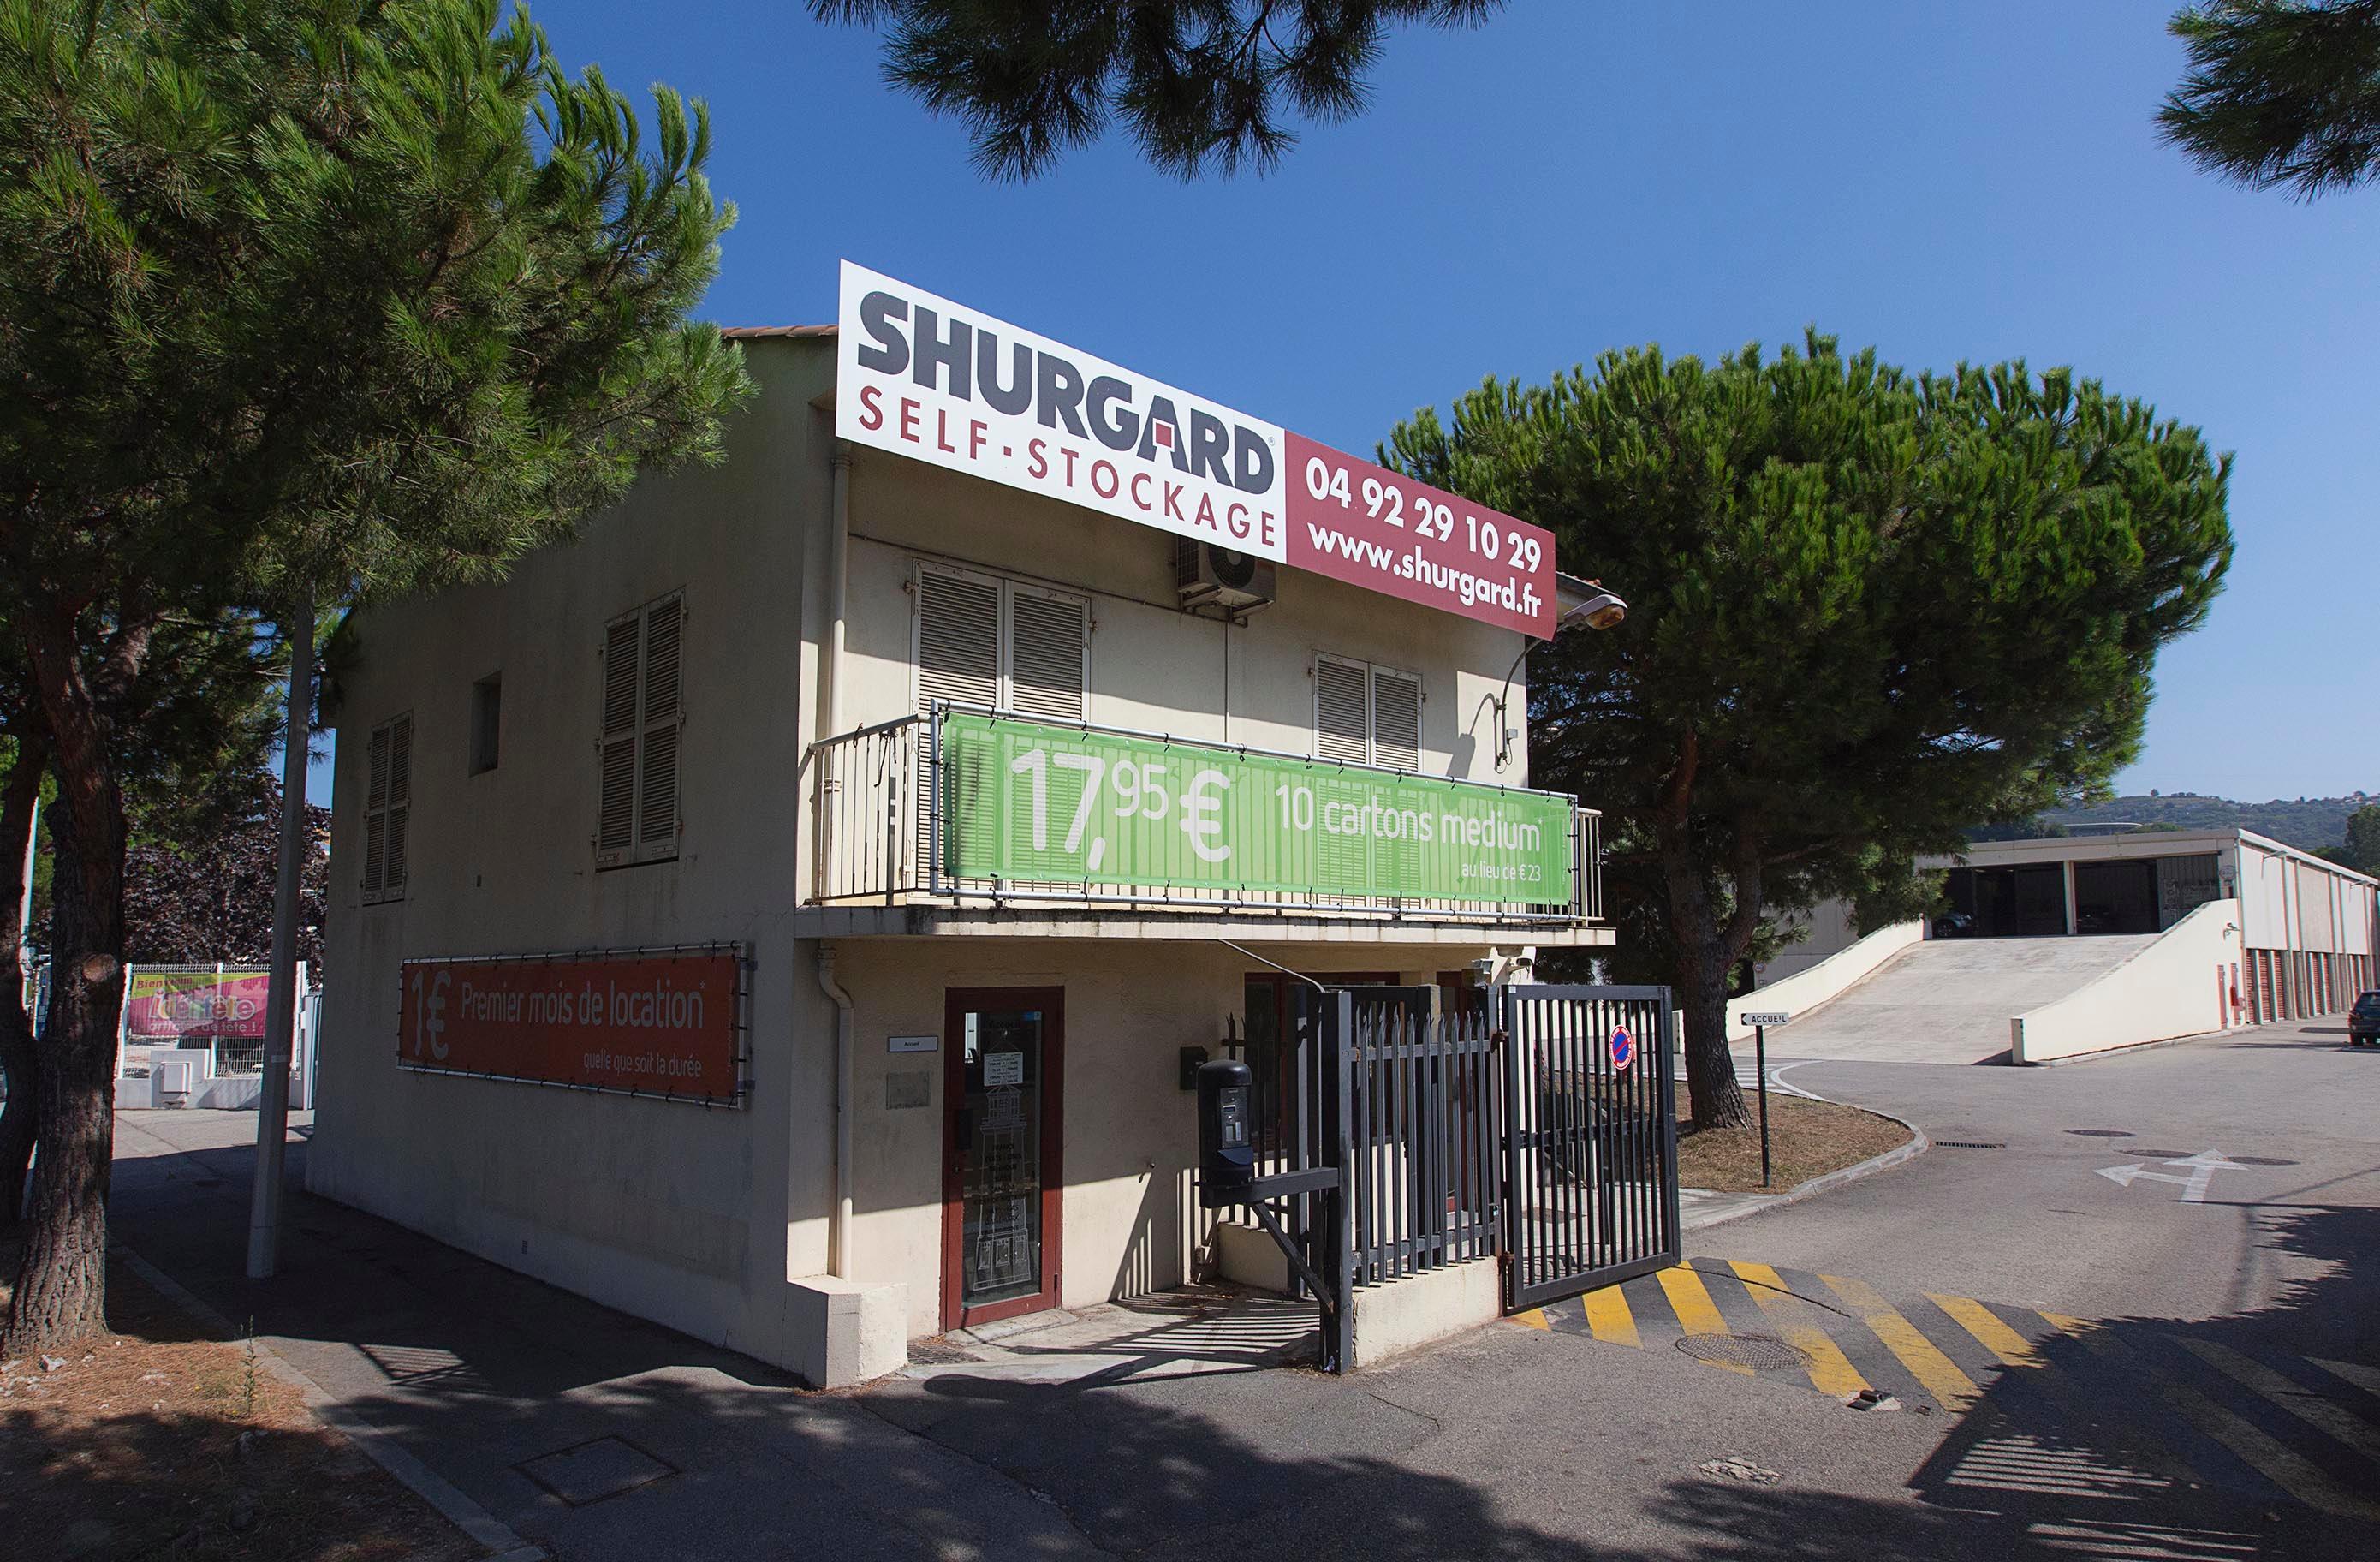 Shurgard Self Storage Nice Saint-Isidore